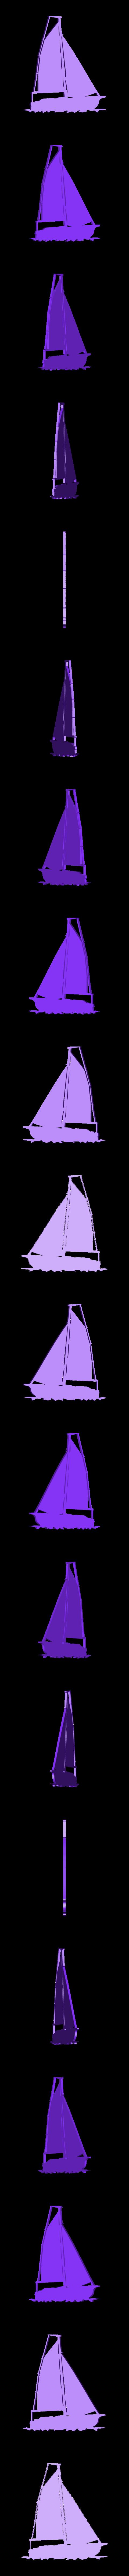 Sailing_boat_5.stl Download STL file SAILING BOAT FOR WALL DECORATION_5 • 3D printable design, 3dprintlines